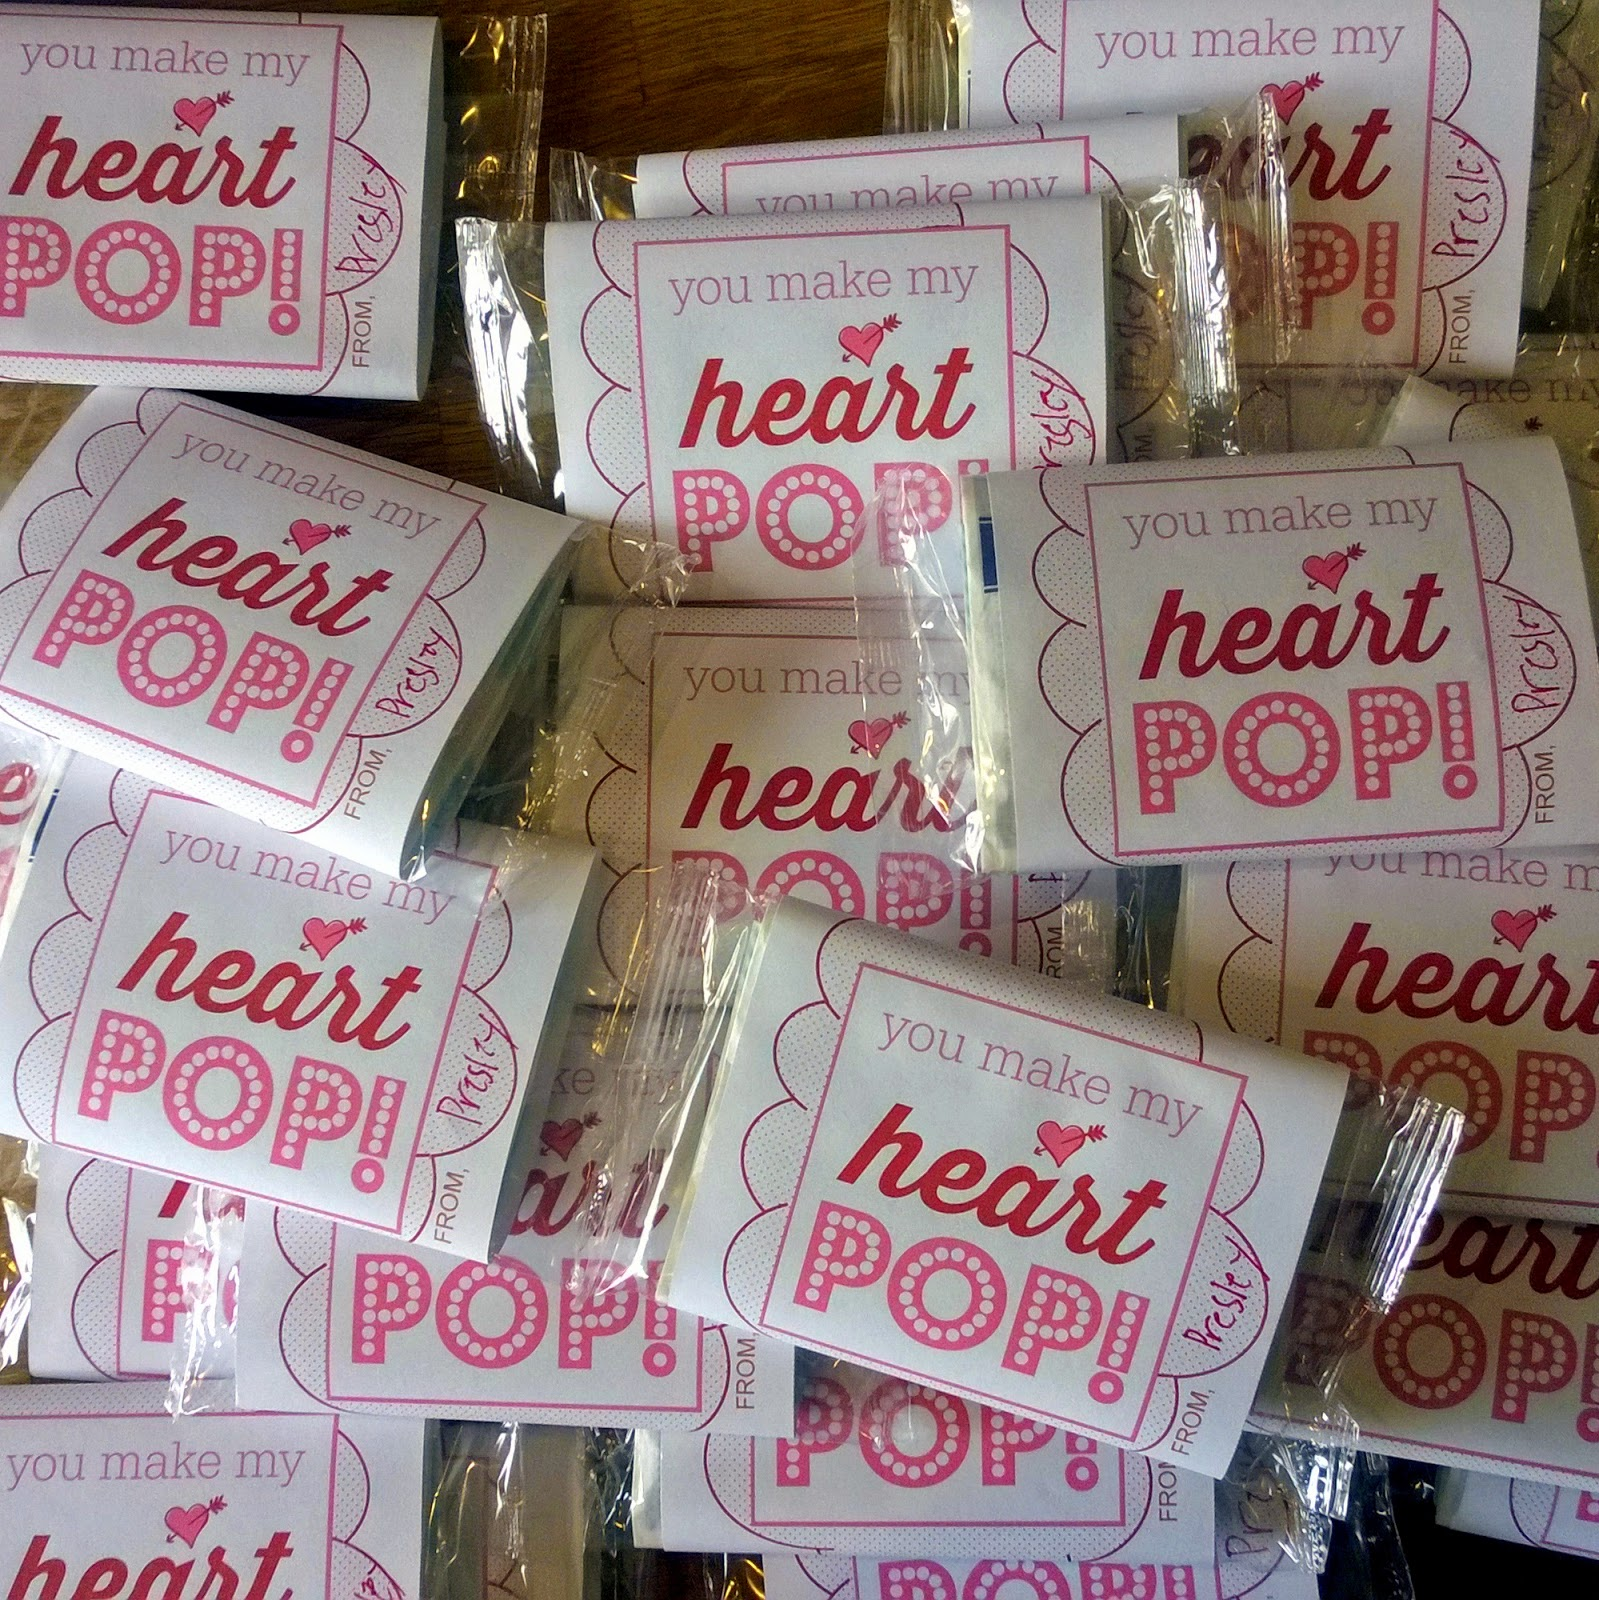 http://www.growinguphui.blogspot.com/2015/02/valentines-microwave-popcorn-treats.html